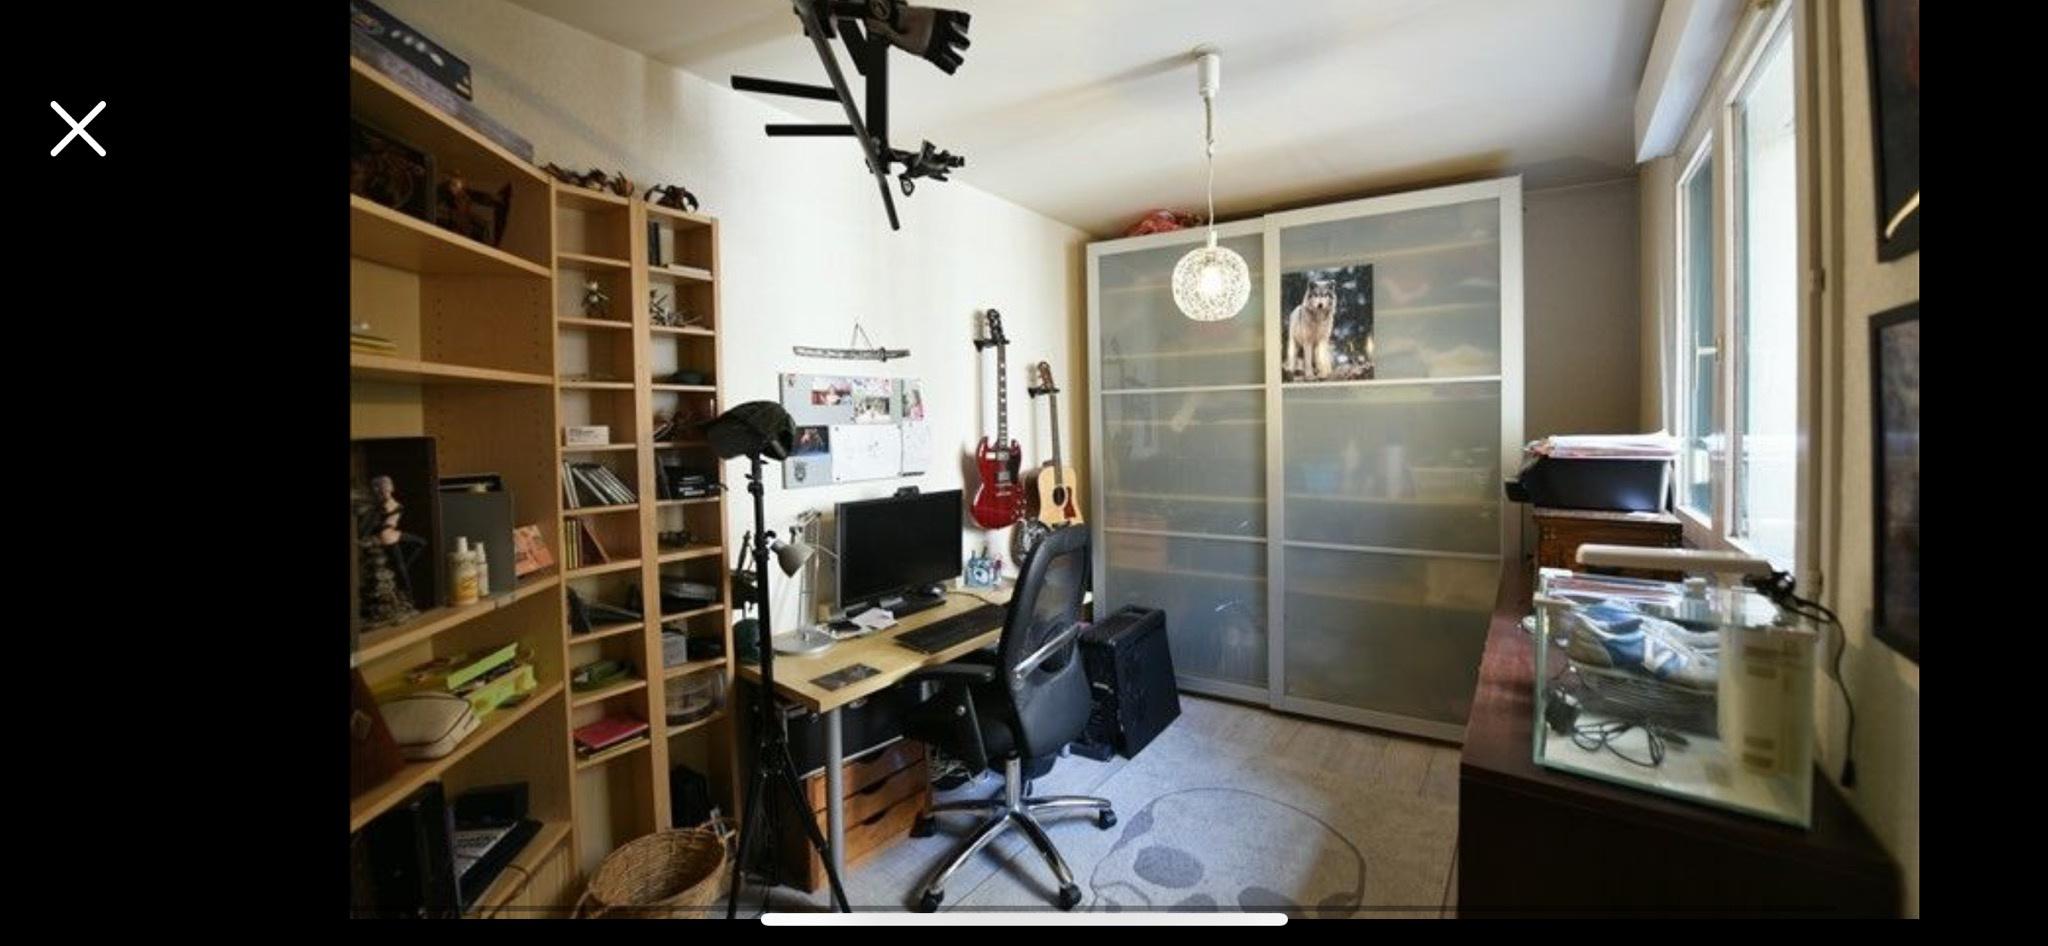 vente immobilier lyon achat immobilier lyon. Black Bedroom Furniture Sets. Home Design Ideas